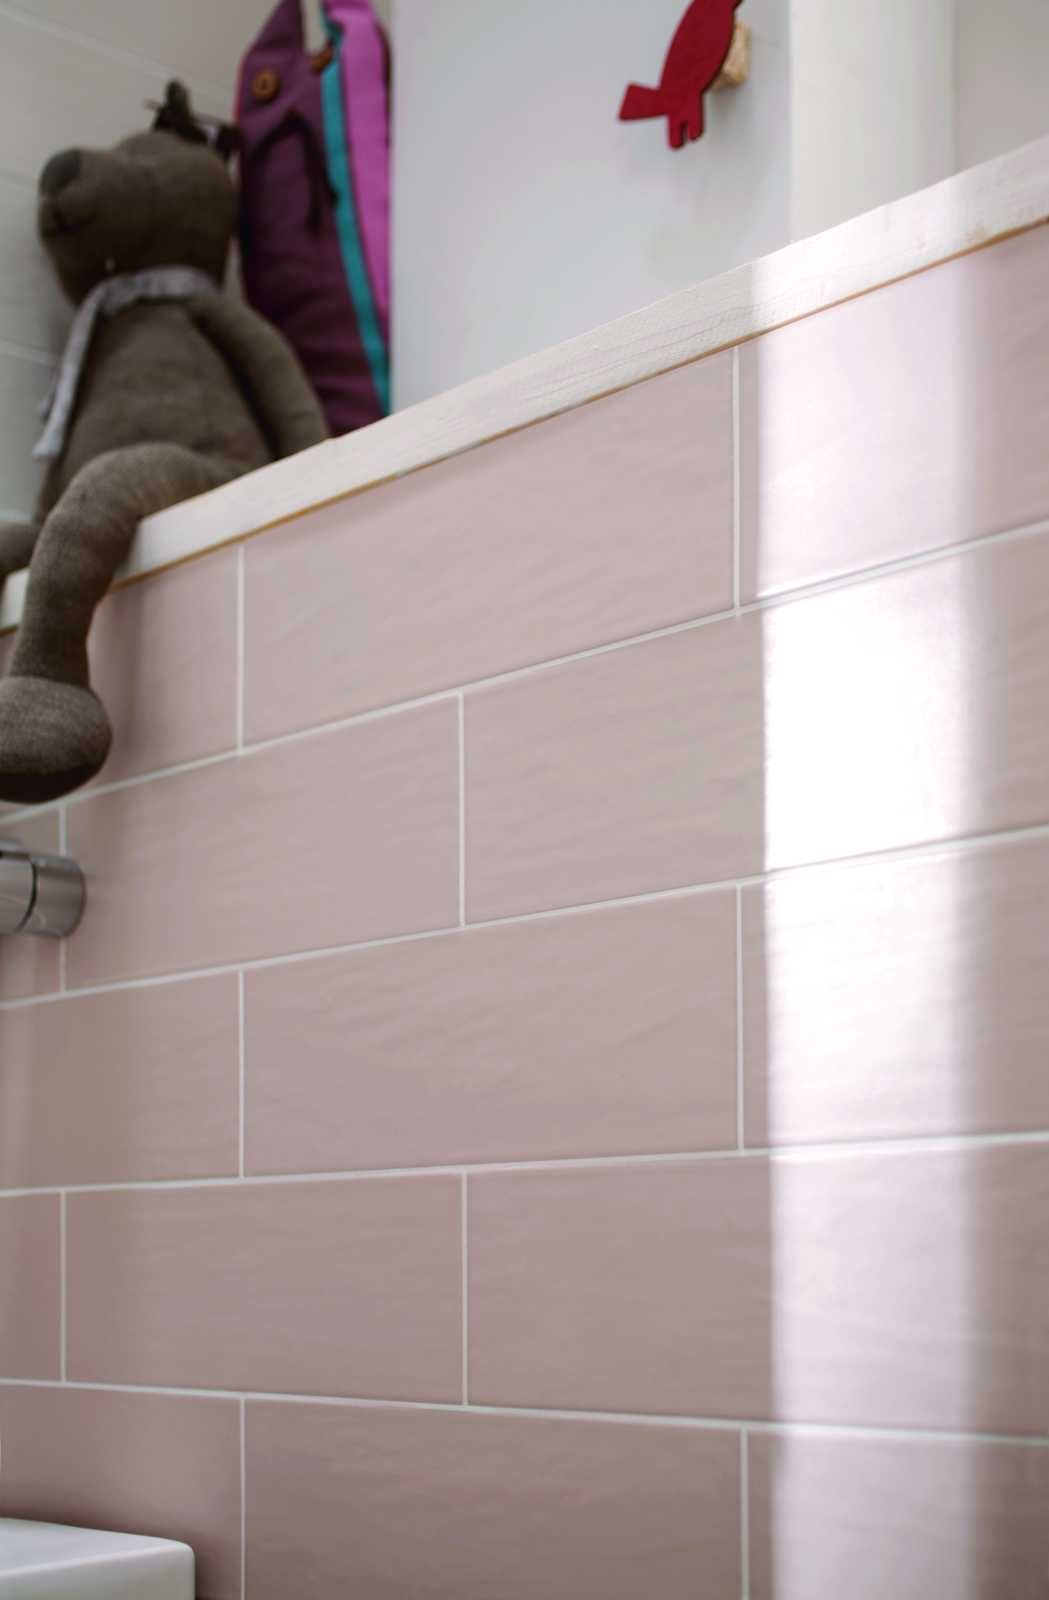 azulejos rosa mira las colecciones marazzi 3001